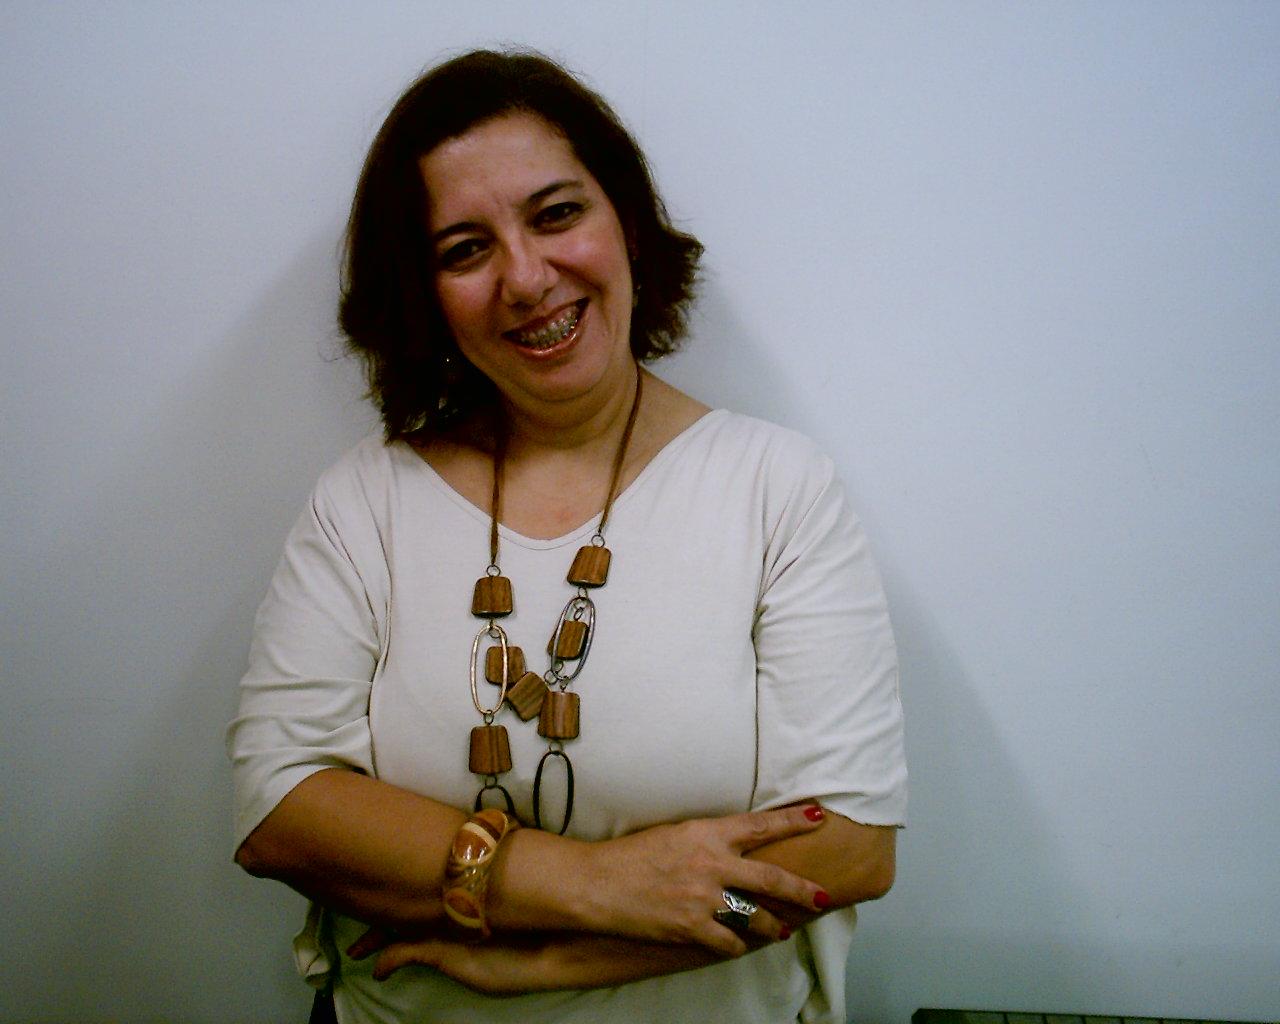 Rosangela Martins